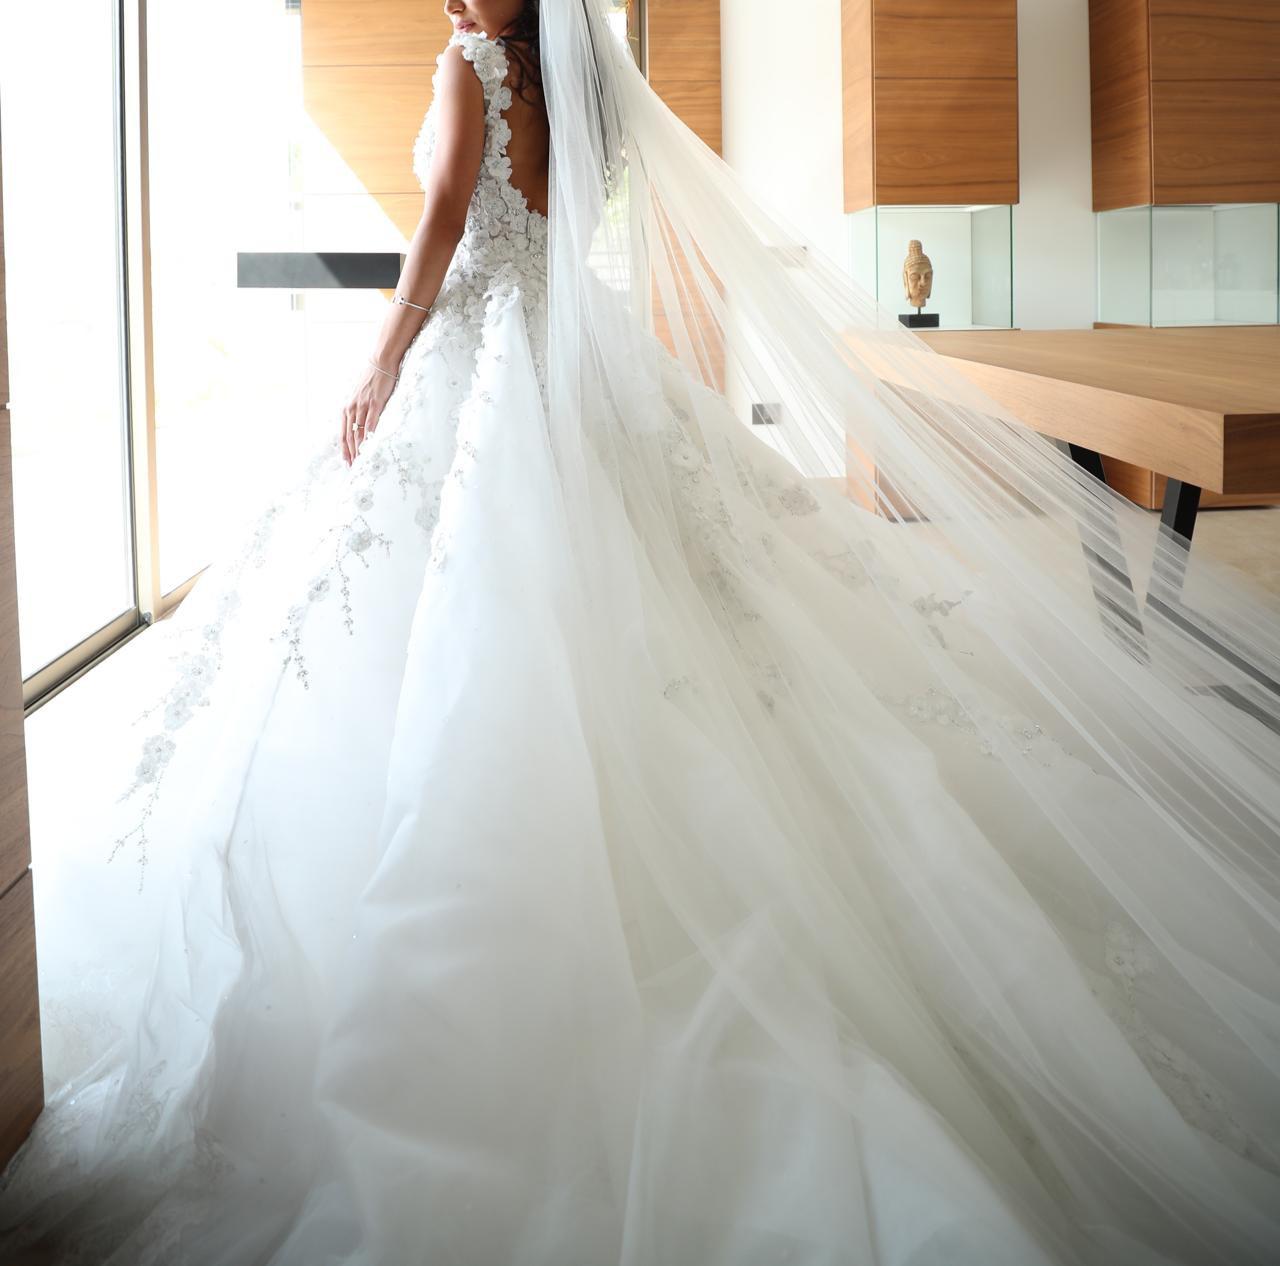 michael cinco custom made wedding dress on sale - 68% off